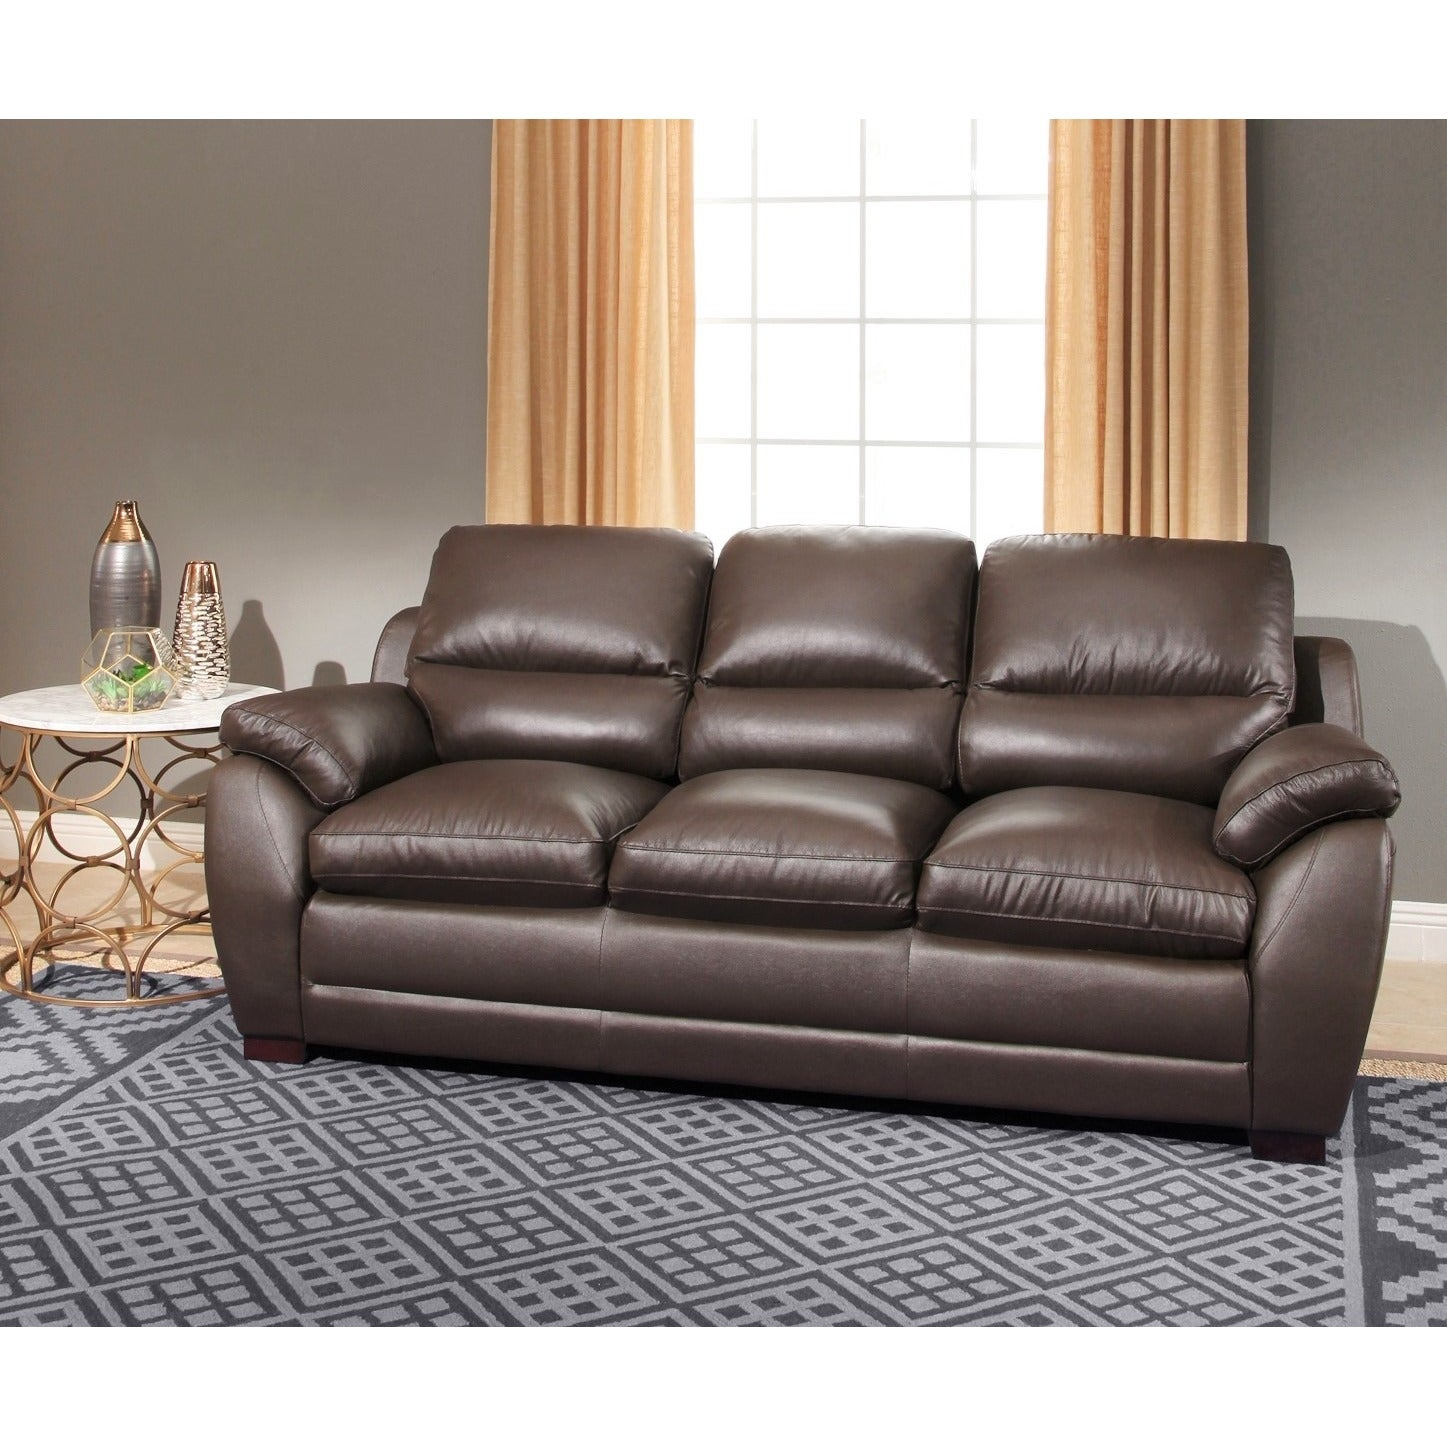 Abbyson Monarch 3-Piece Top Grain Leather Sofa Set - Free Shipping ...